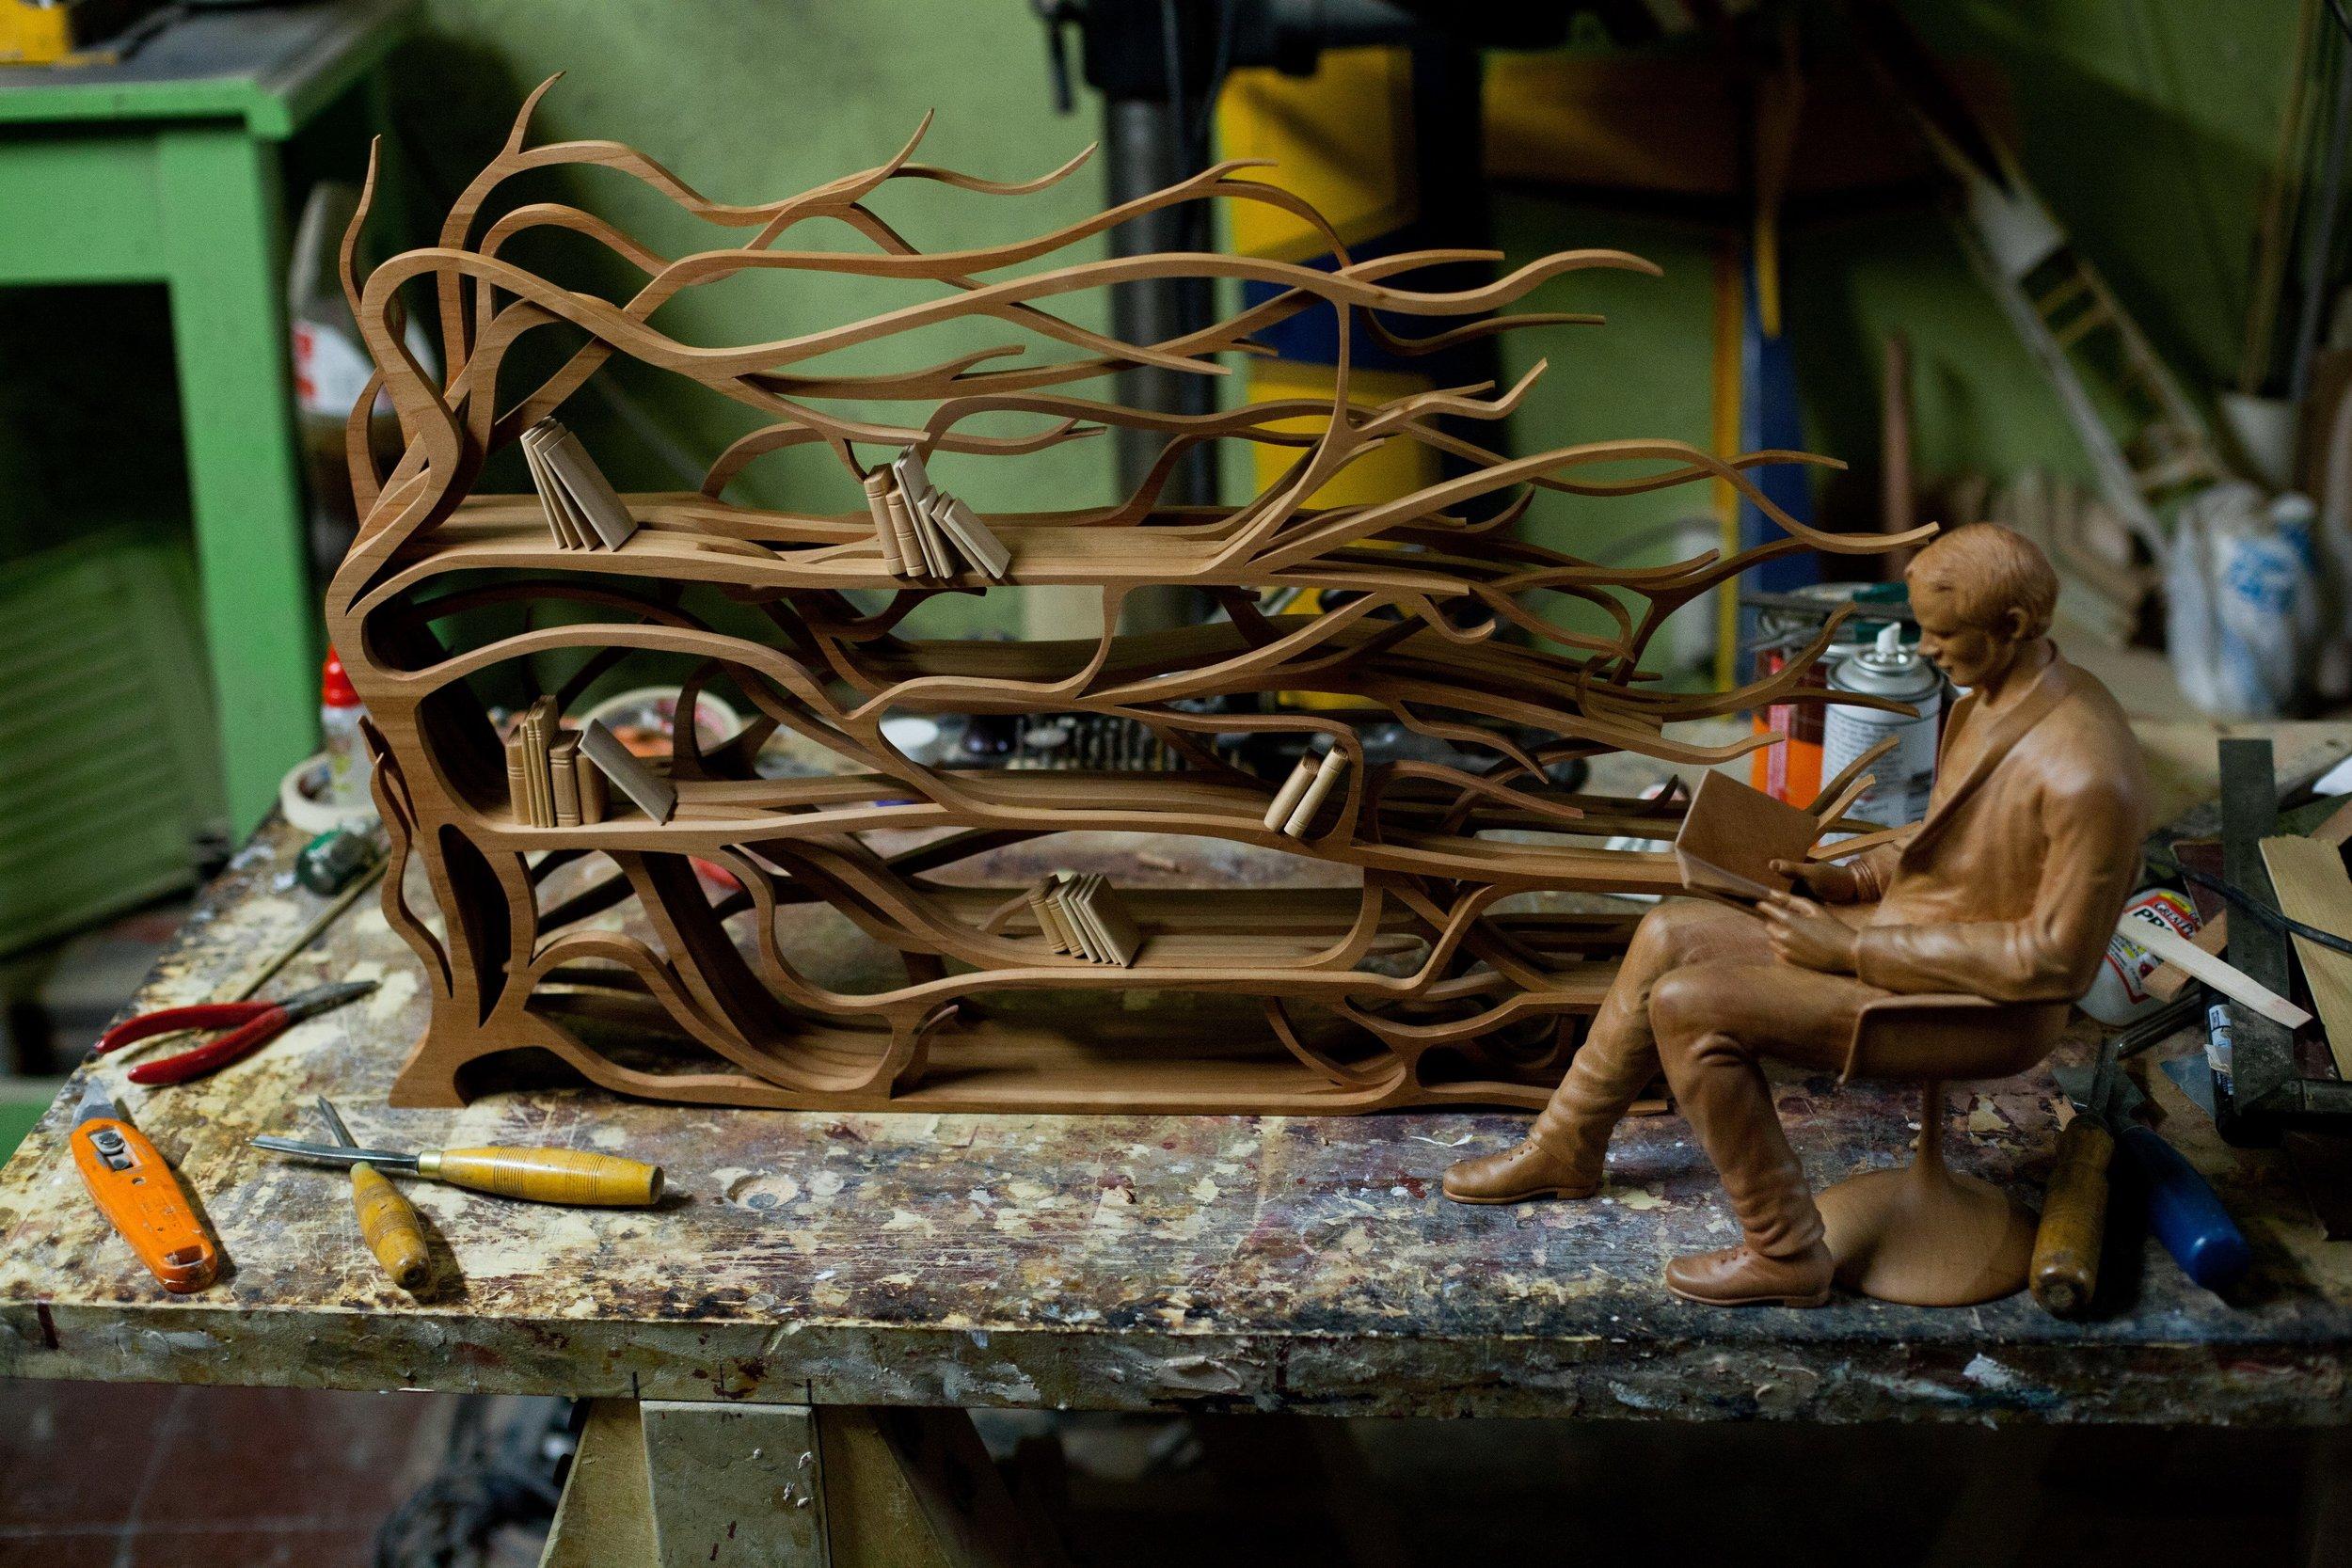 Sebastian ErraZuriz,  Metamorphosis maquette , 2009.Rauli.18 x 30 x 10 in.Courtesy of Sebastian Errazuriz Studio.2016.SE.01.Photo: Sebastian Errazuriz Studio  METHOD:Hand carved, dremels,rotary tools